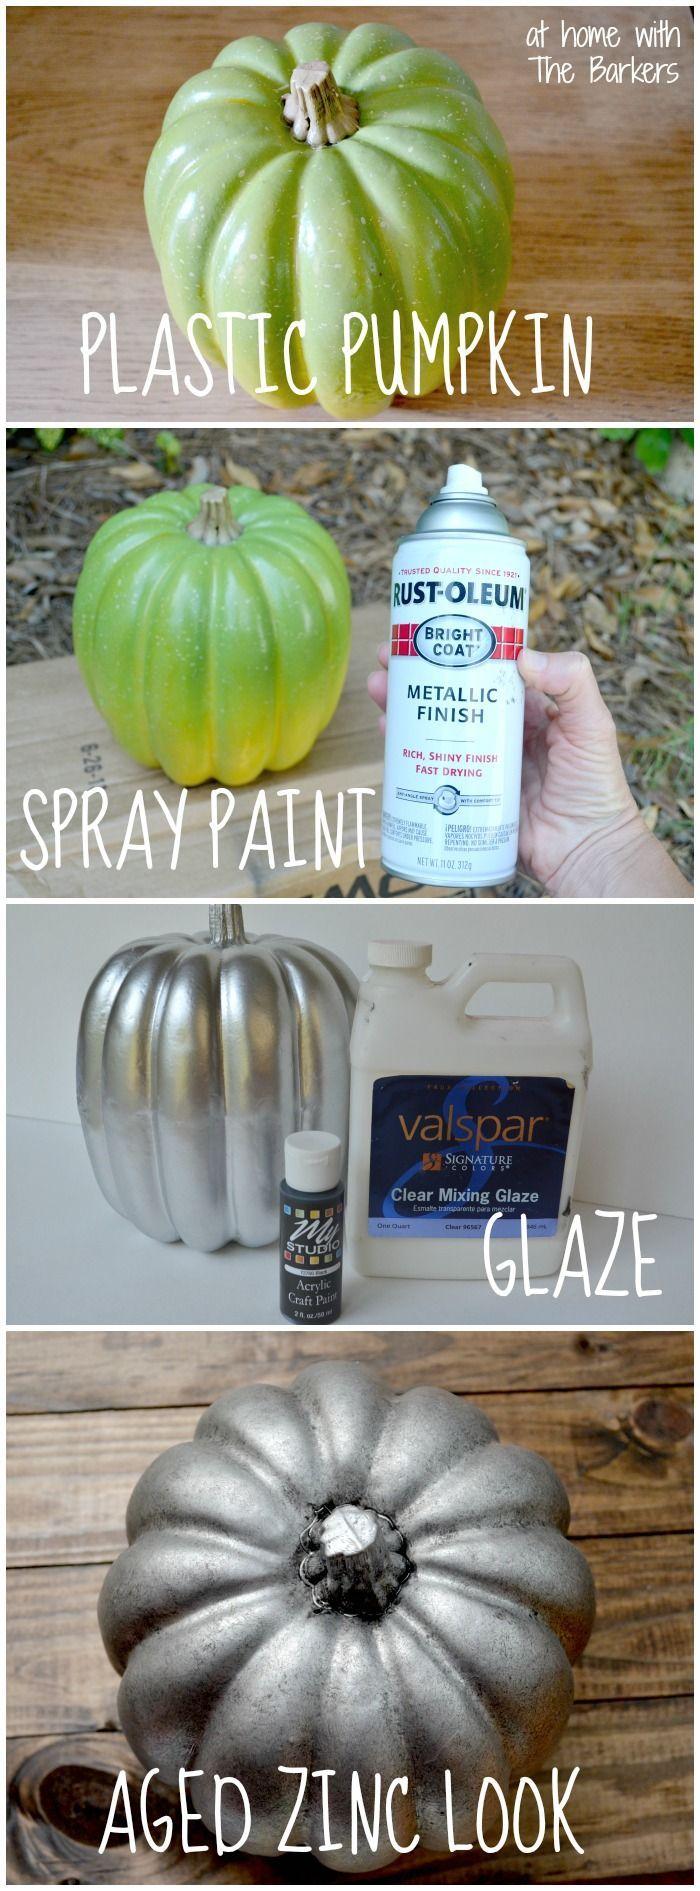 25 best spray paint plastic trending ideas on pinterest. Black Bedroom Furniture Sets. Home Design Ideas